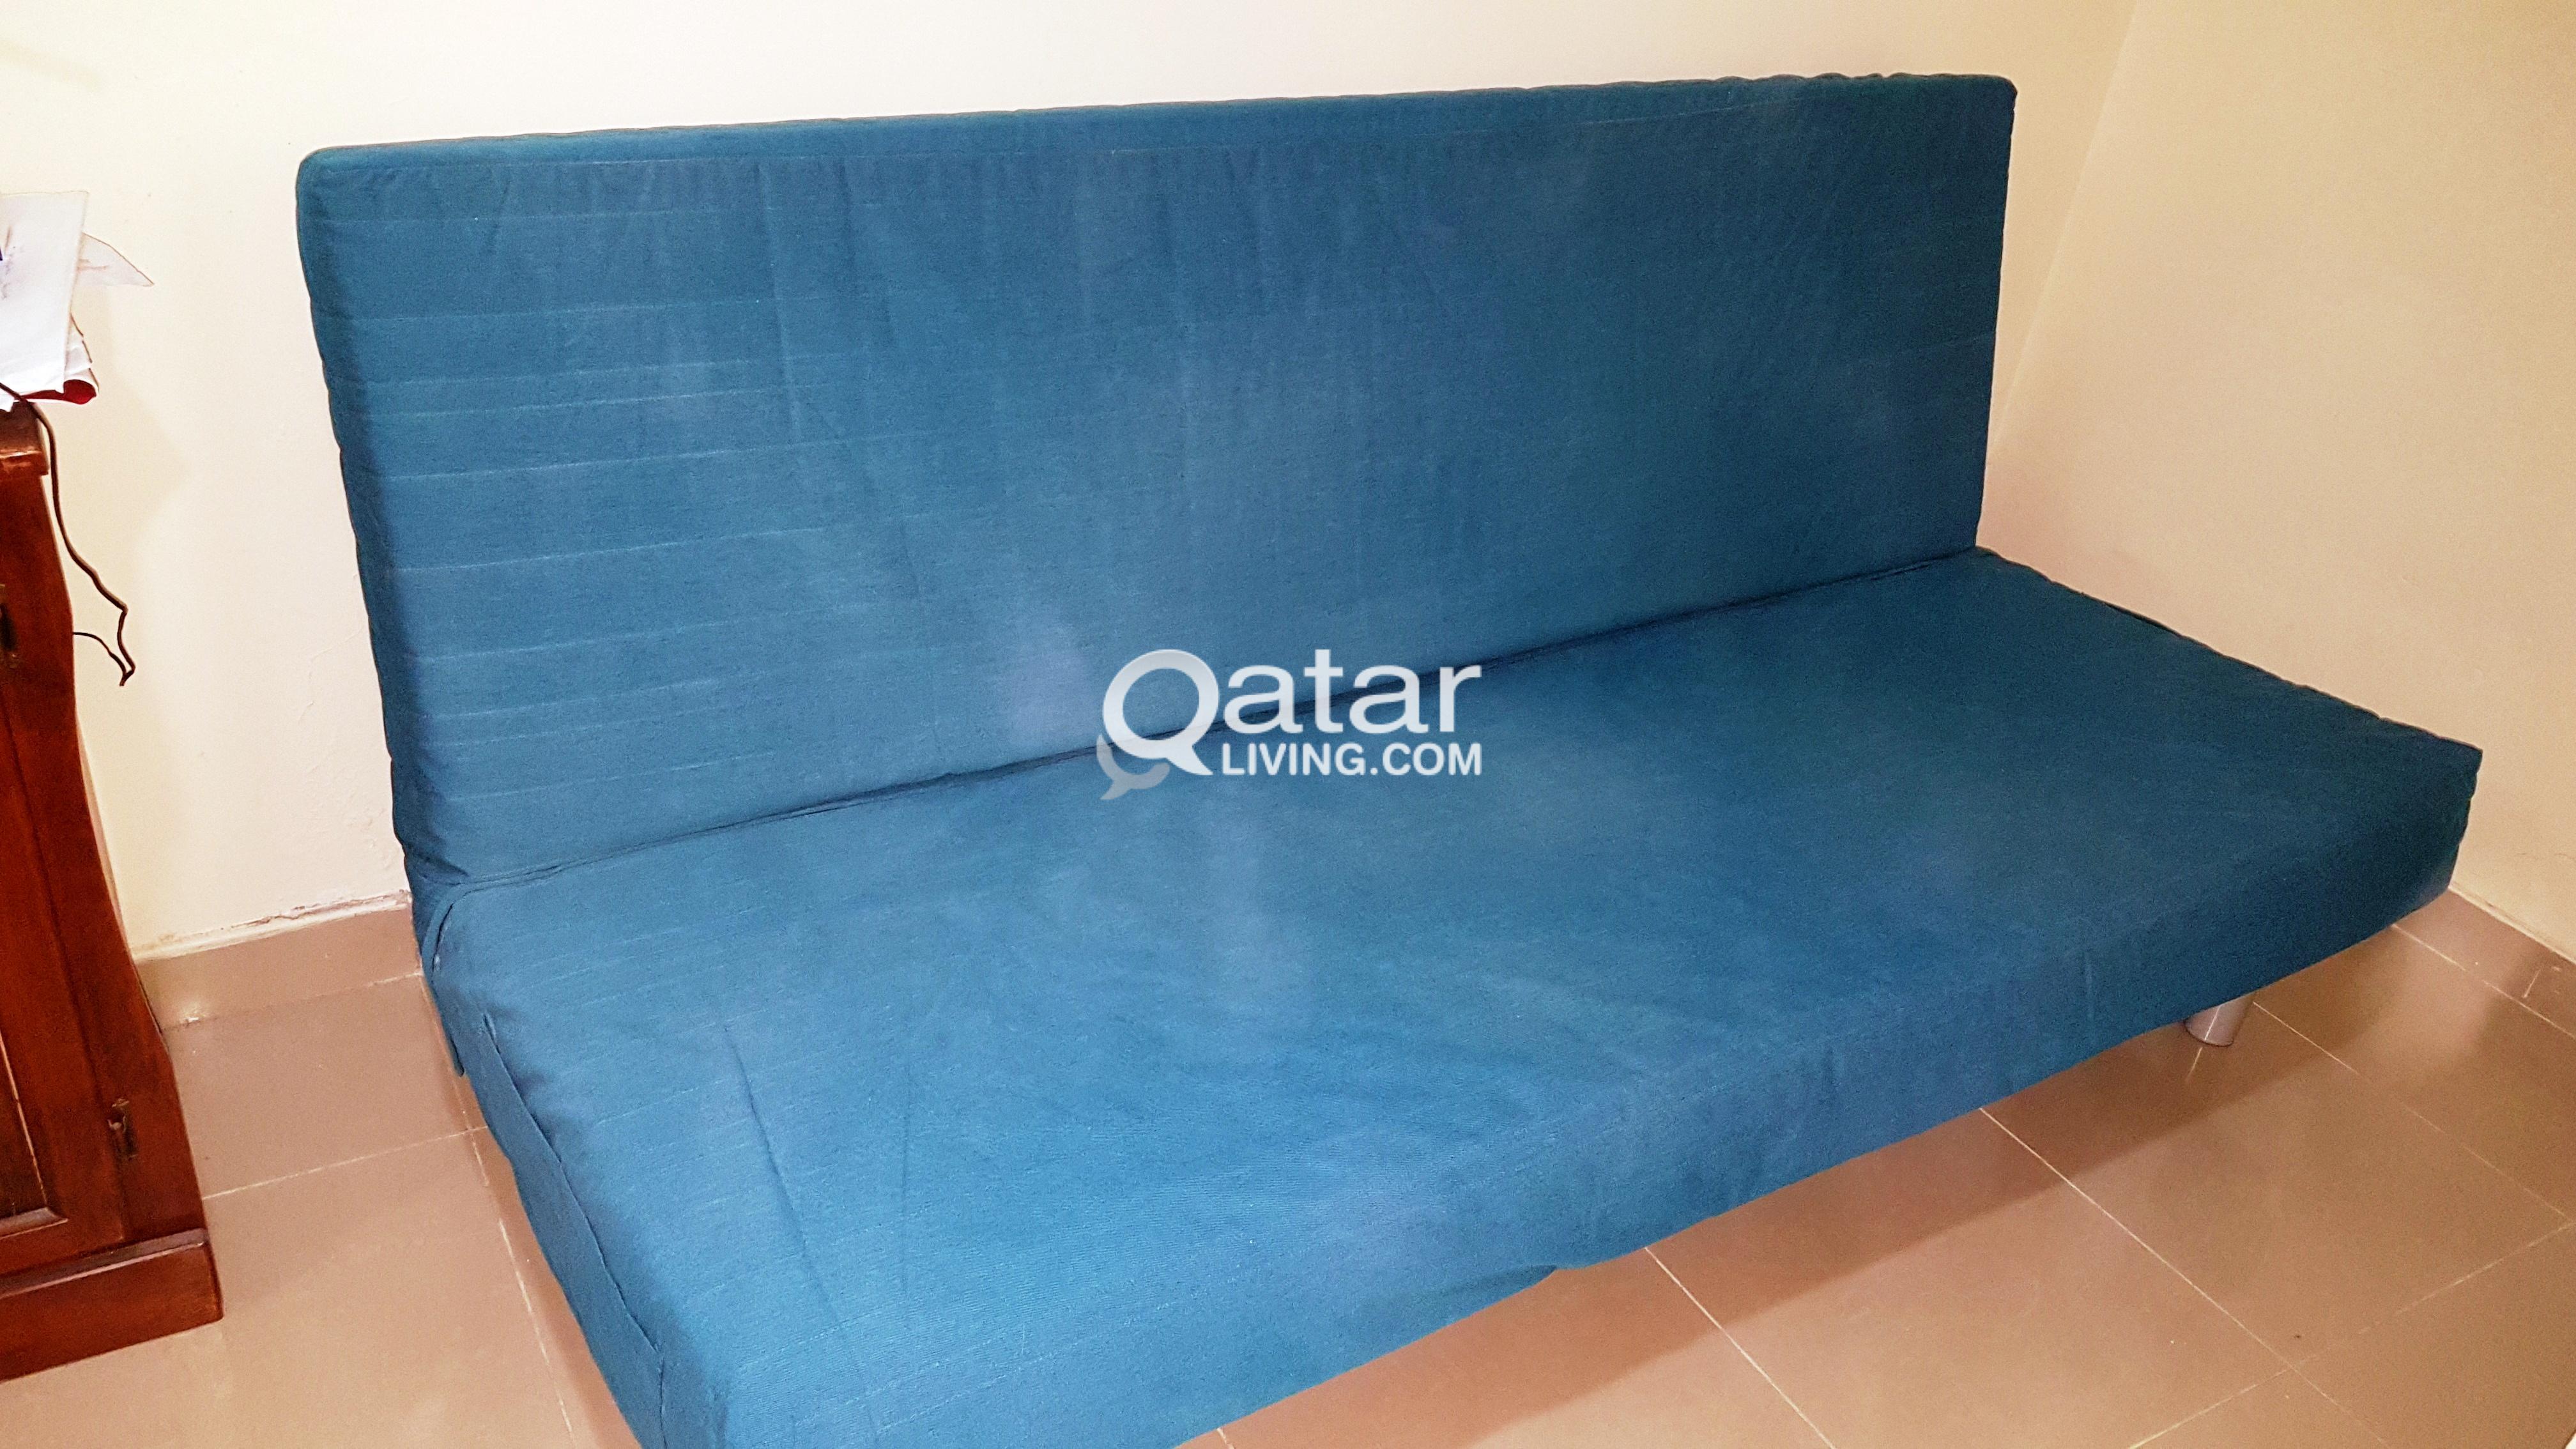 3 Seat Ikea Beddinge Sofa Bed With Pocket Spring Mattress Borred Blue And Ikea Beddinge Bed Storage Box Qatar Living